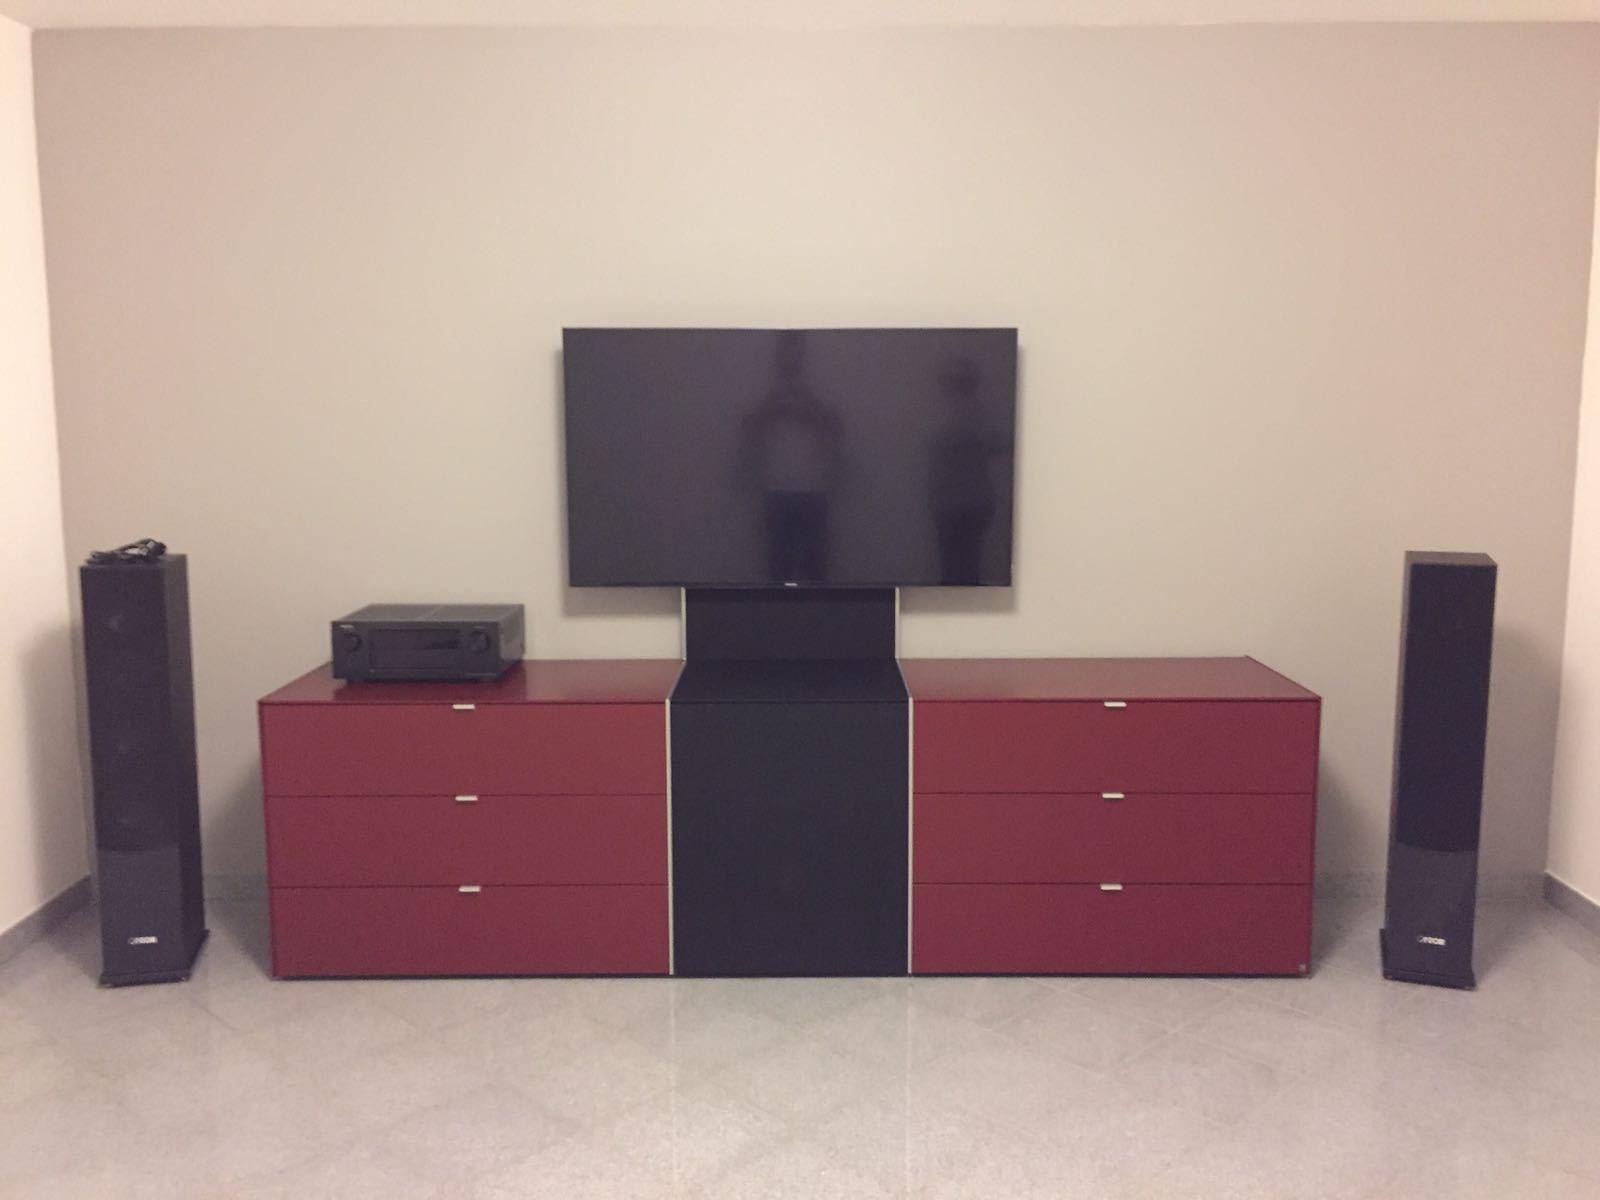 q media hifi bildergalerie. Black Bedroom Furniture Sets. Home Design Ideas